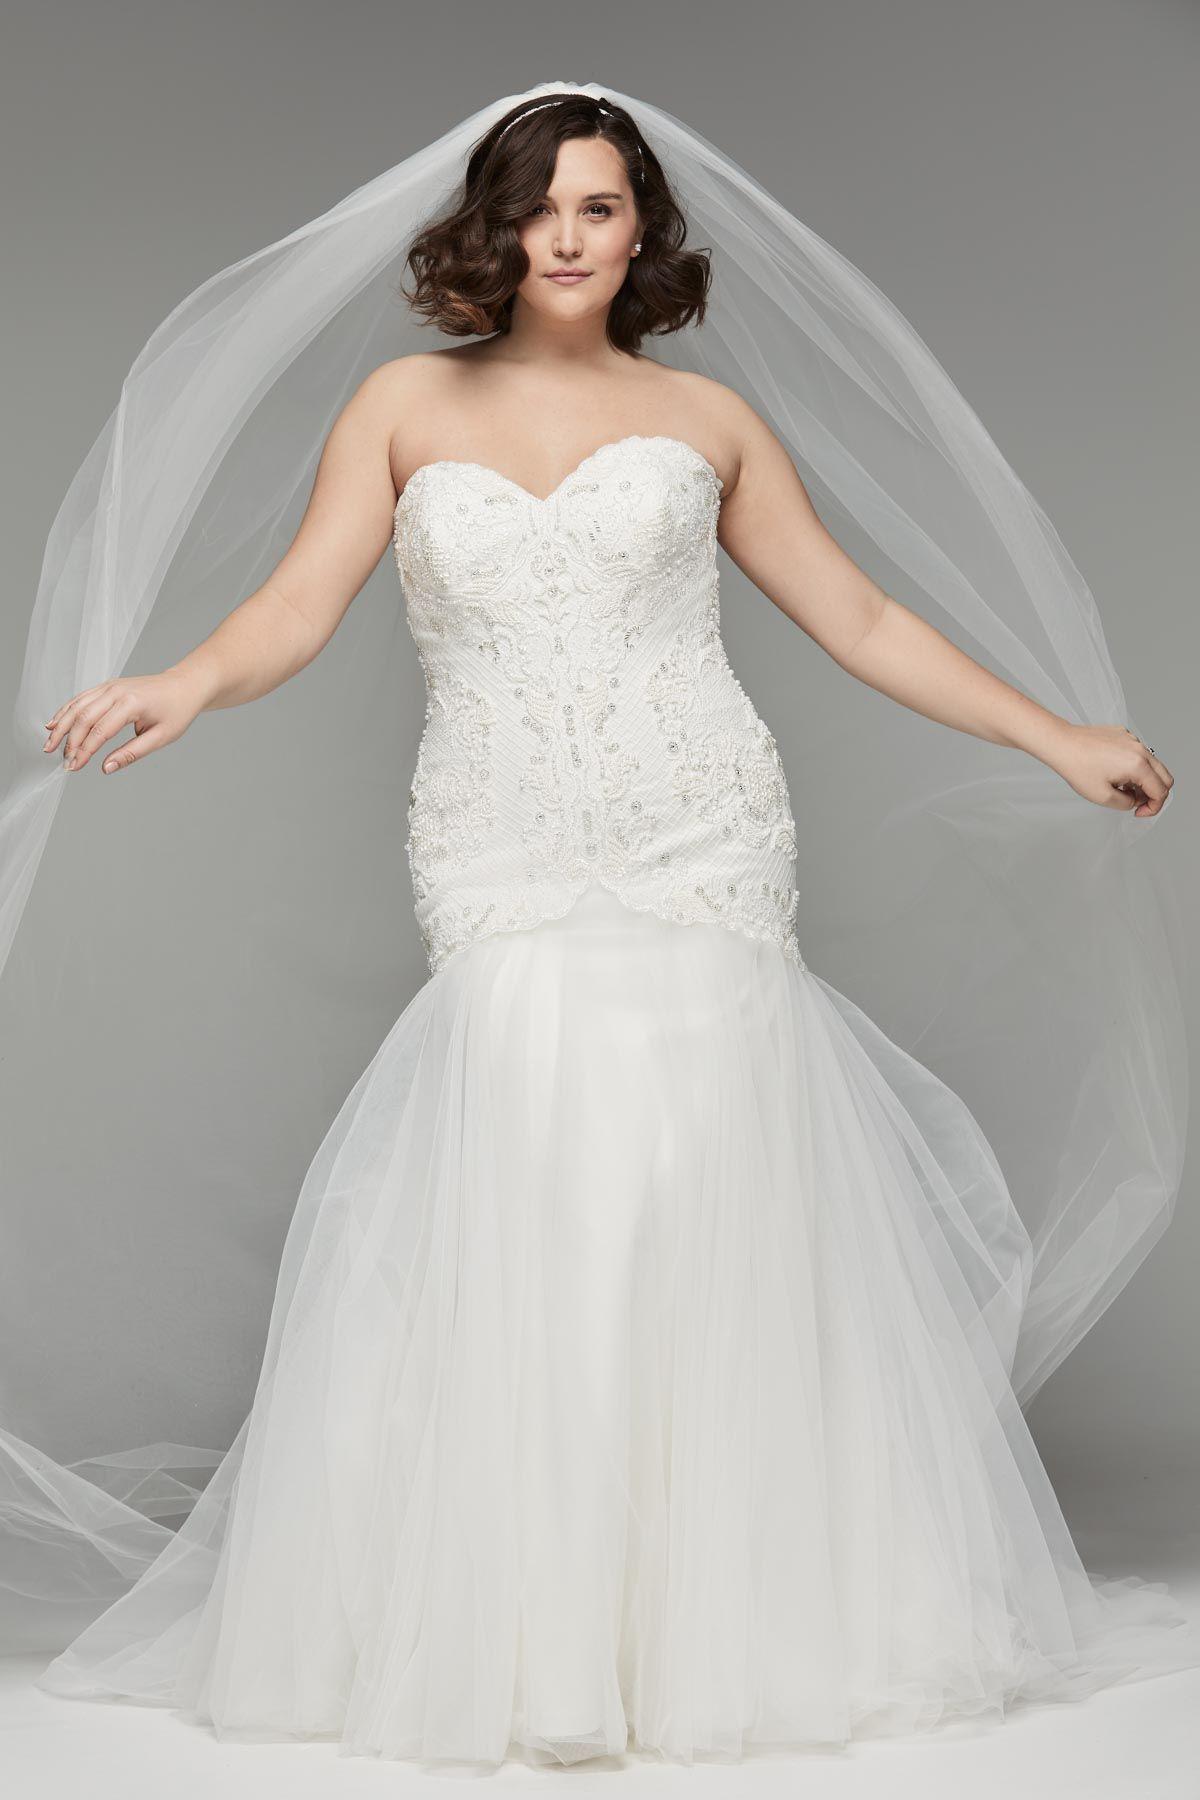 Shaina b watters brides watters bridal in pinterest